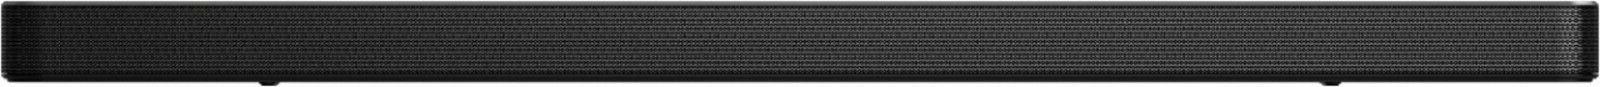 LG Channel Soundbar-Wireless Sub